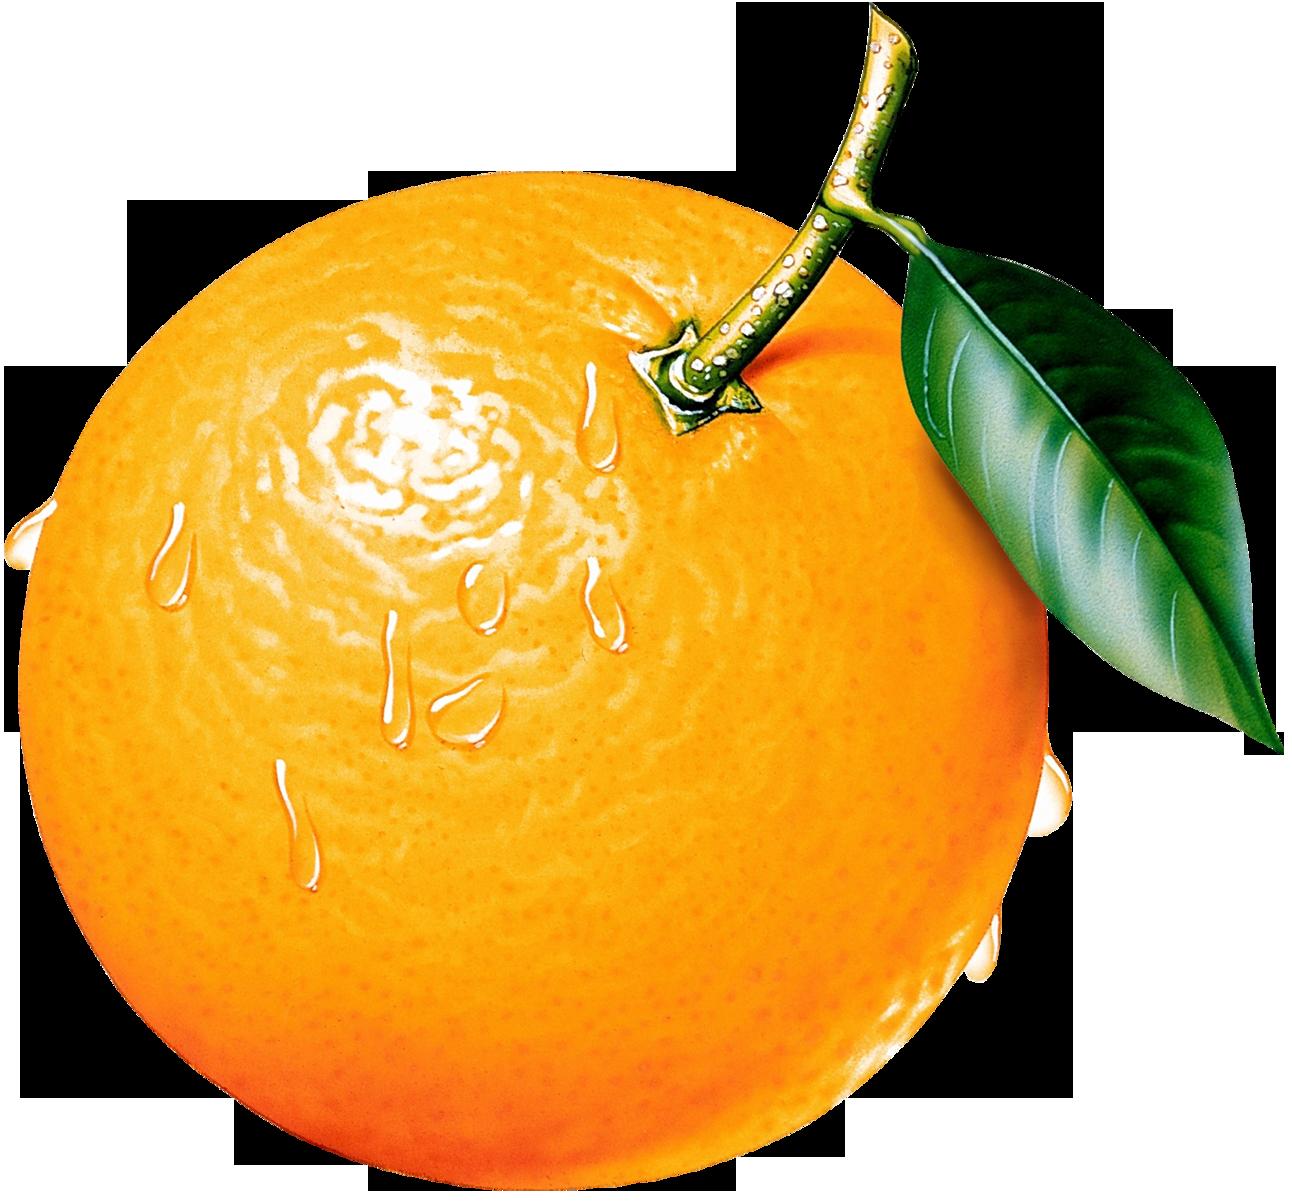 Free Fruit Orange Cliparts, Download Free Clip Art, Free.